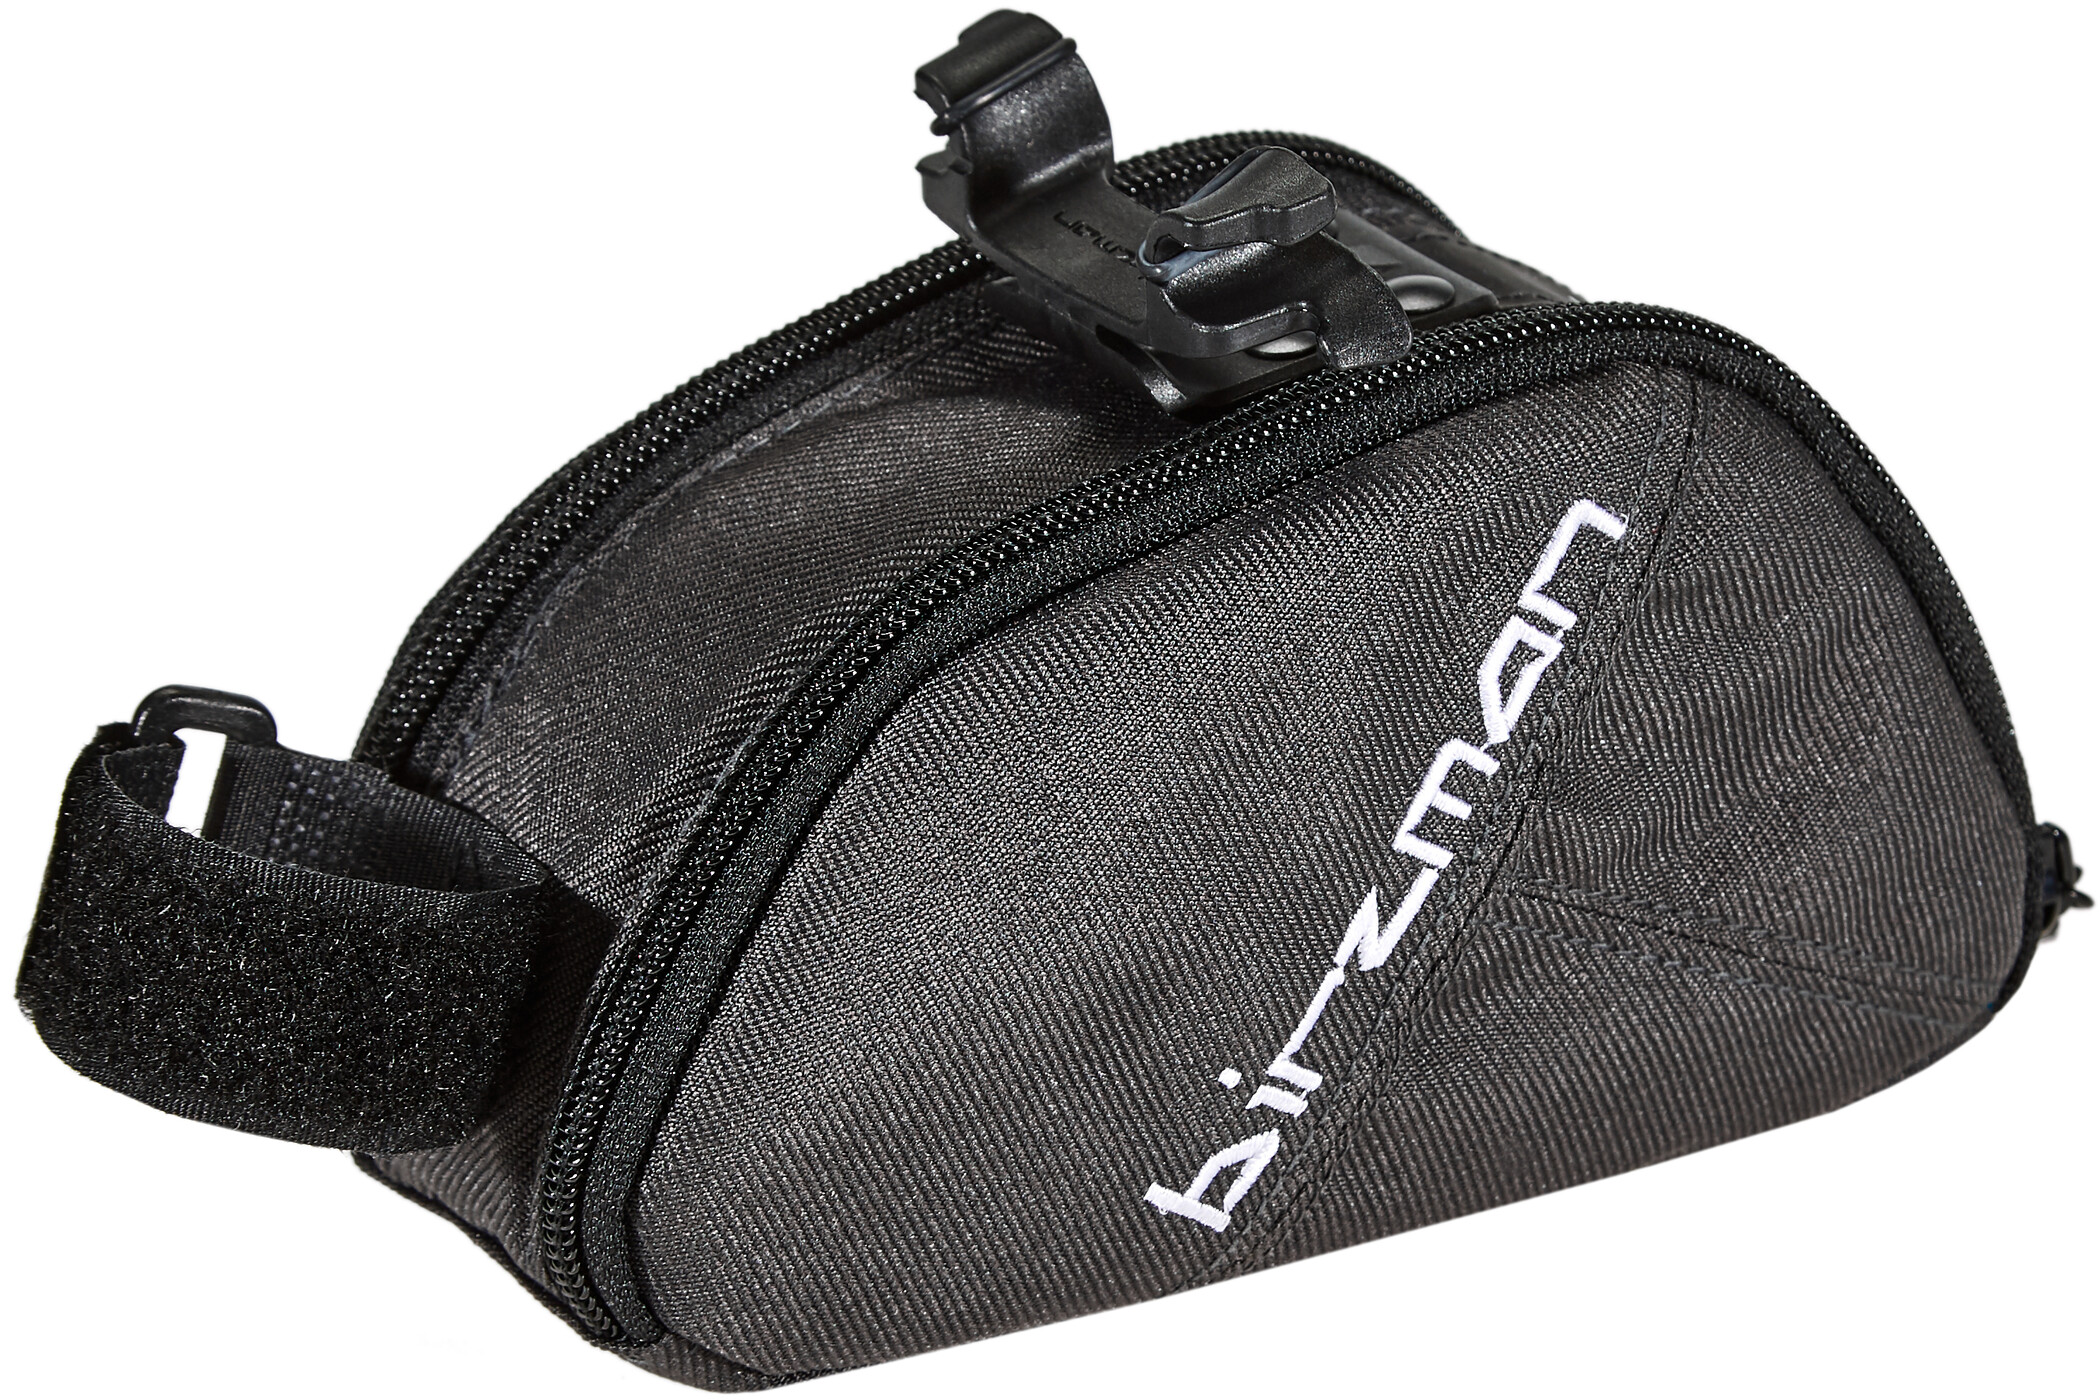 Birzman M-Snug Sadeltaske 500ml, black (2019) | Saddle bags